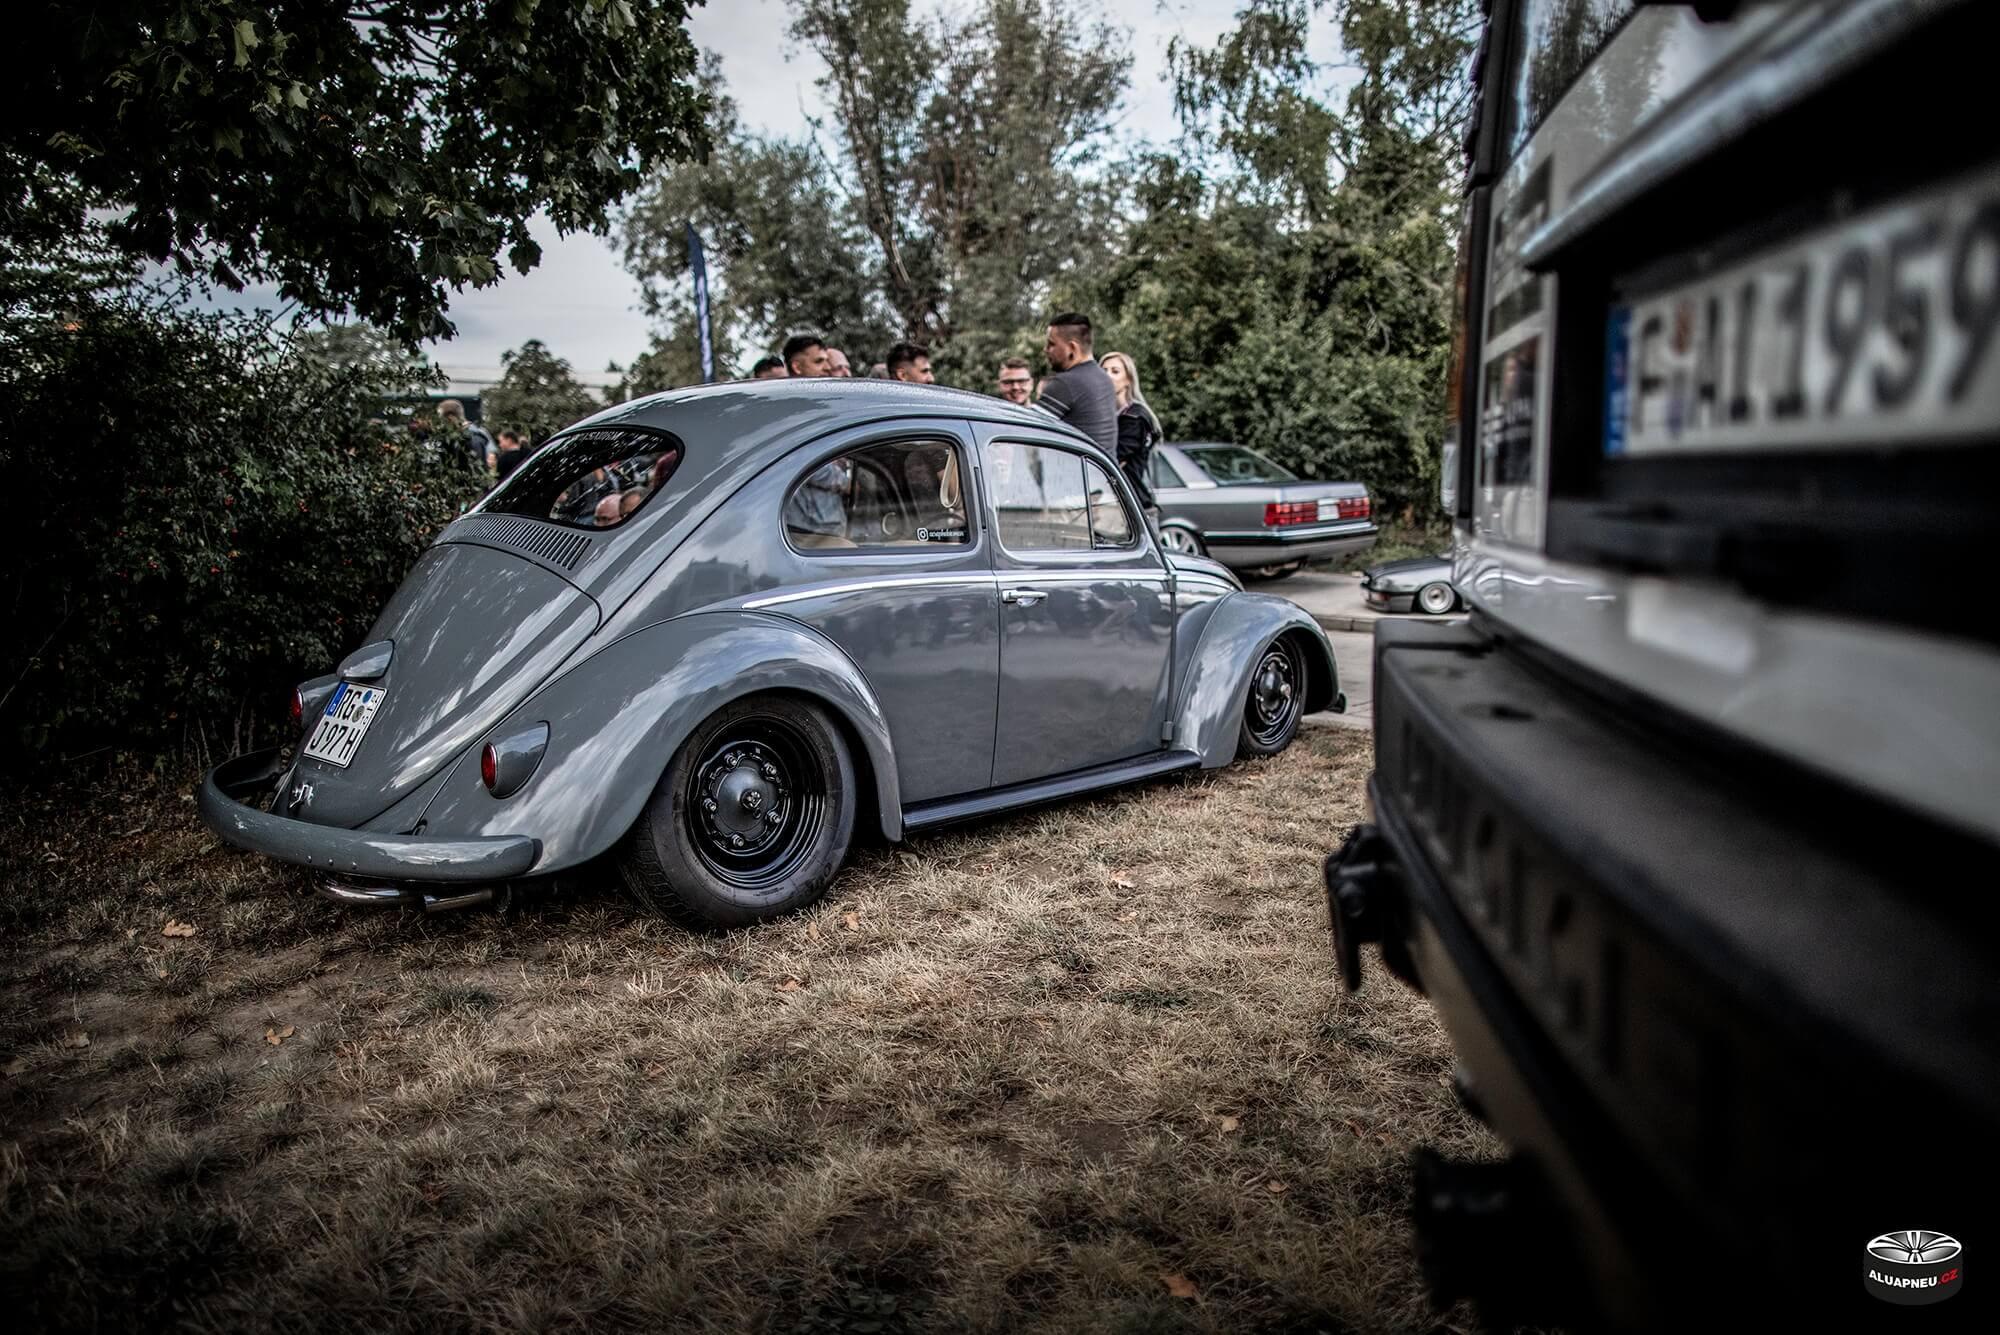 Tuning kola Vw Beetle - XS Classic Carnight 5.0 - Drážďany tuning sraz 2019 - www.aluapneu.cz